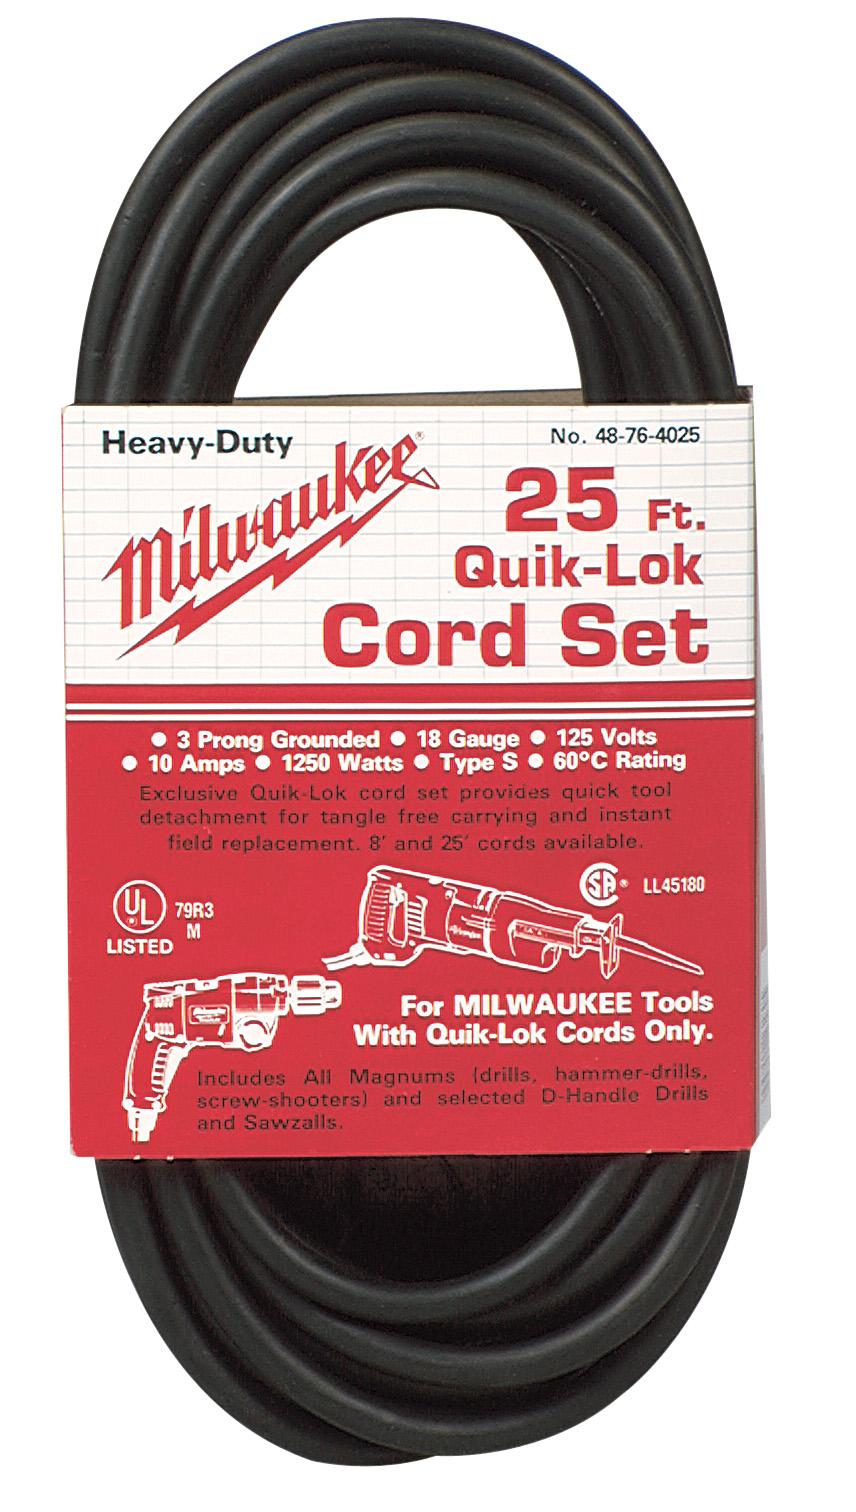 25 ft. 3-Wire Quik-Lok Cord